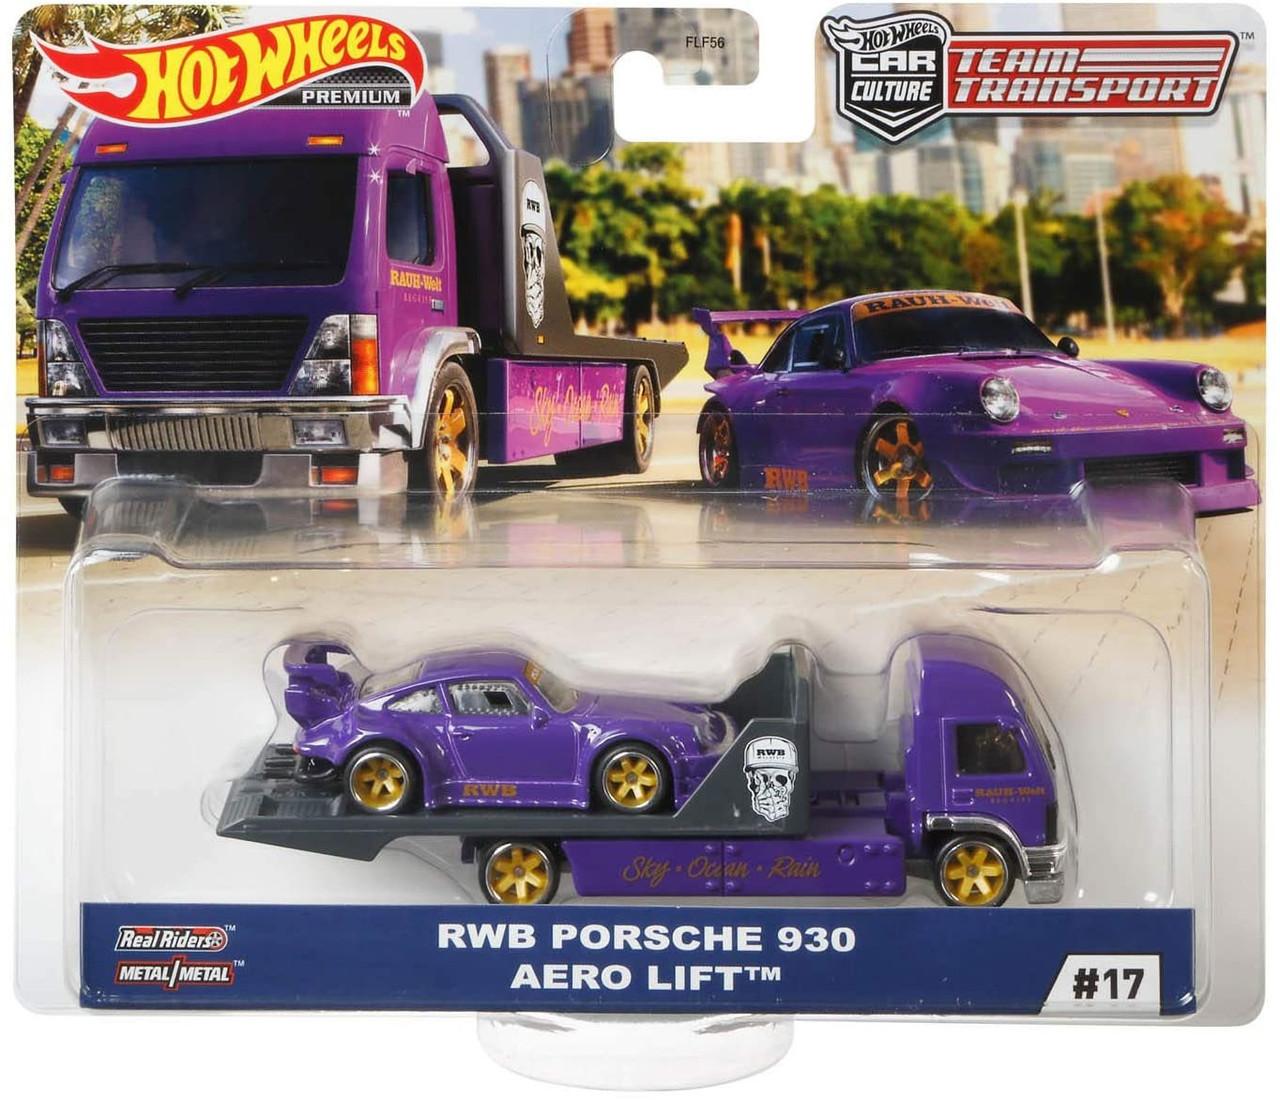 Hot Wheels Car Culture Team Transport Rwb Porsche 930 Aero Lift 164 Diecast Car Mattel Toys Toywiz